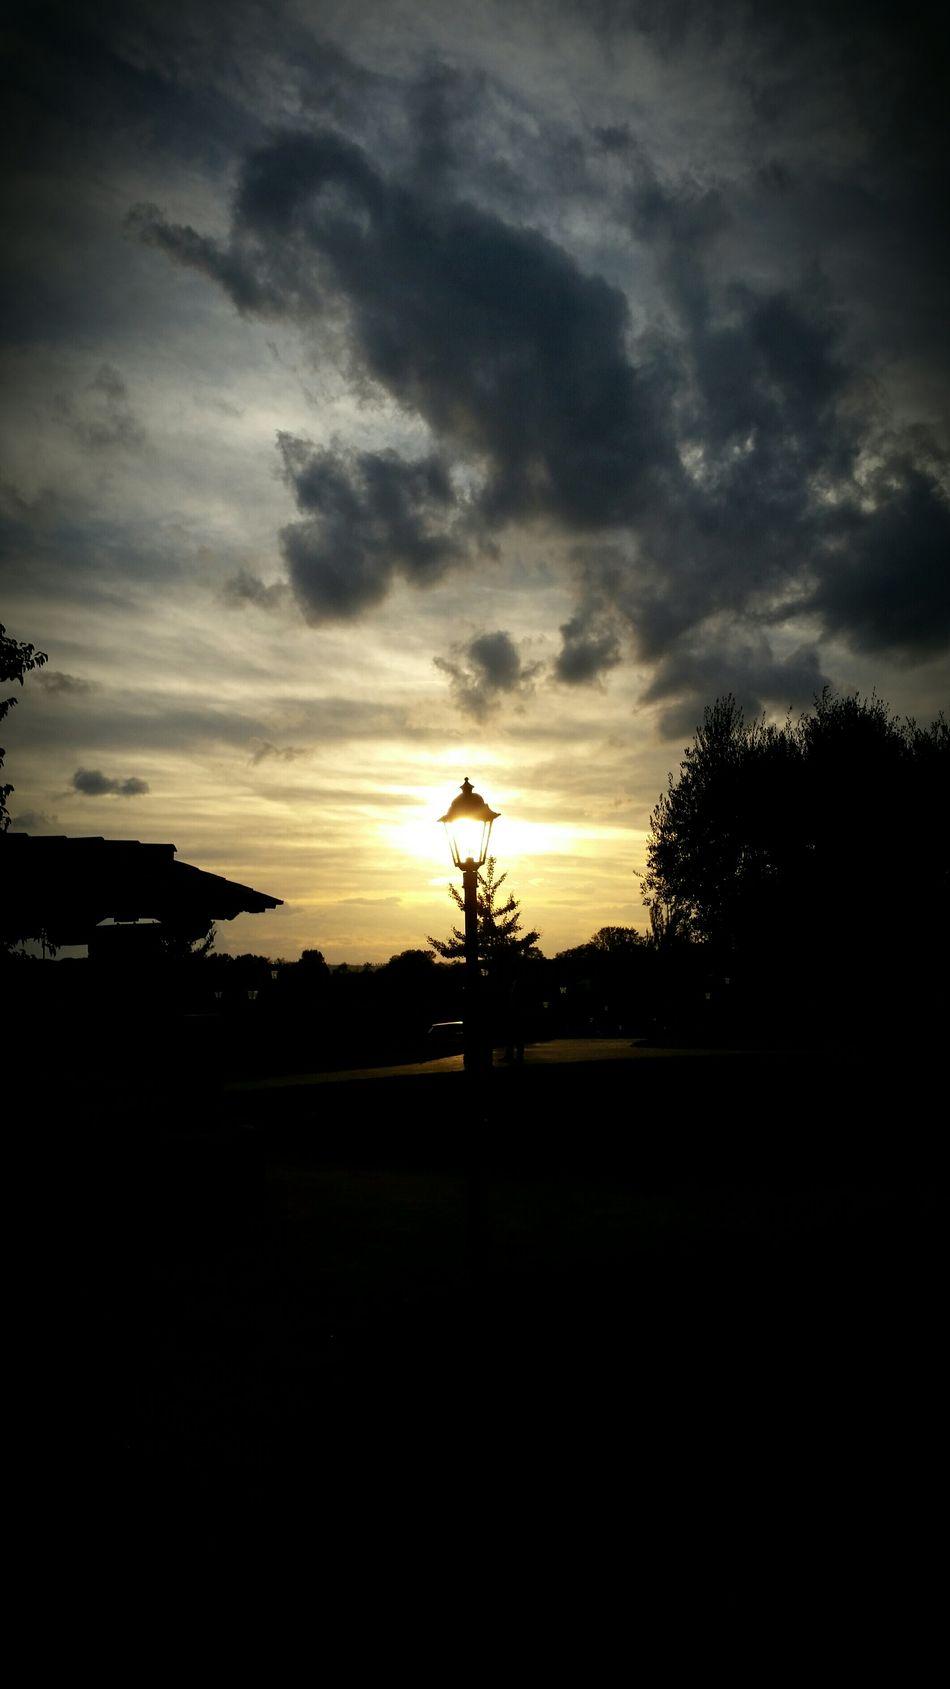 Enjoying The Sun Sunset_captures Eyeem Best Shots - Silhouette Beautiful Sunset Peace And Quiet EyeEm Best Shots - Sunsets + Sunrise EyeEm Best Shots Sunset Light Popular Photo Sunsetlover